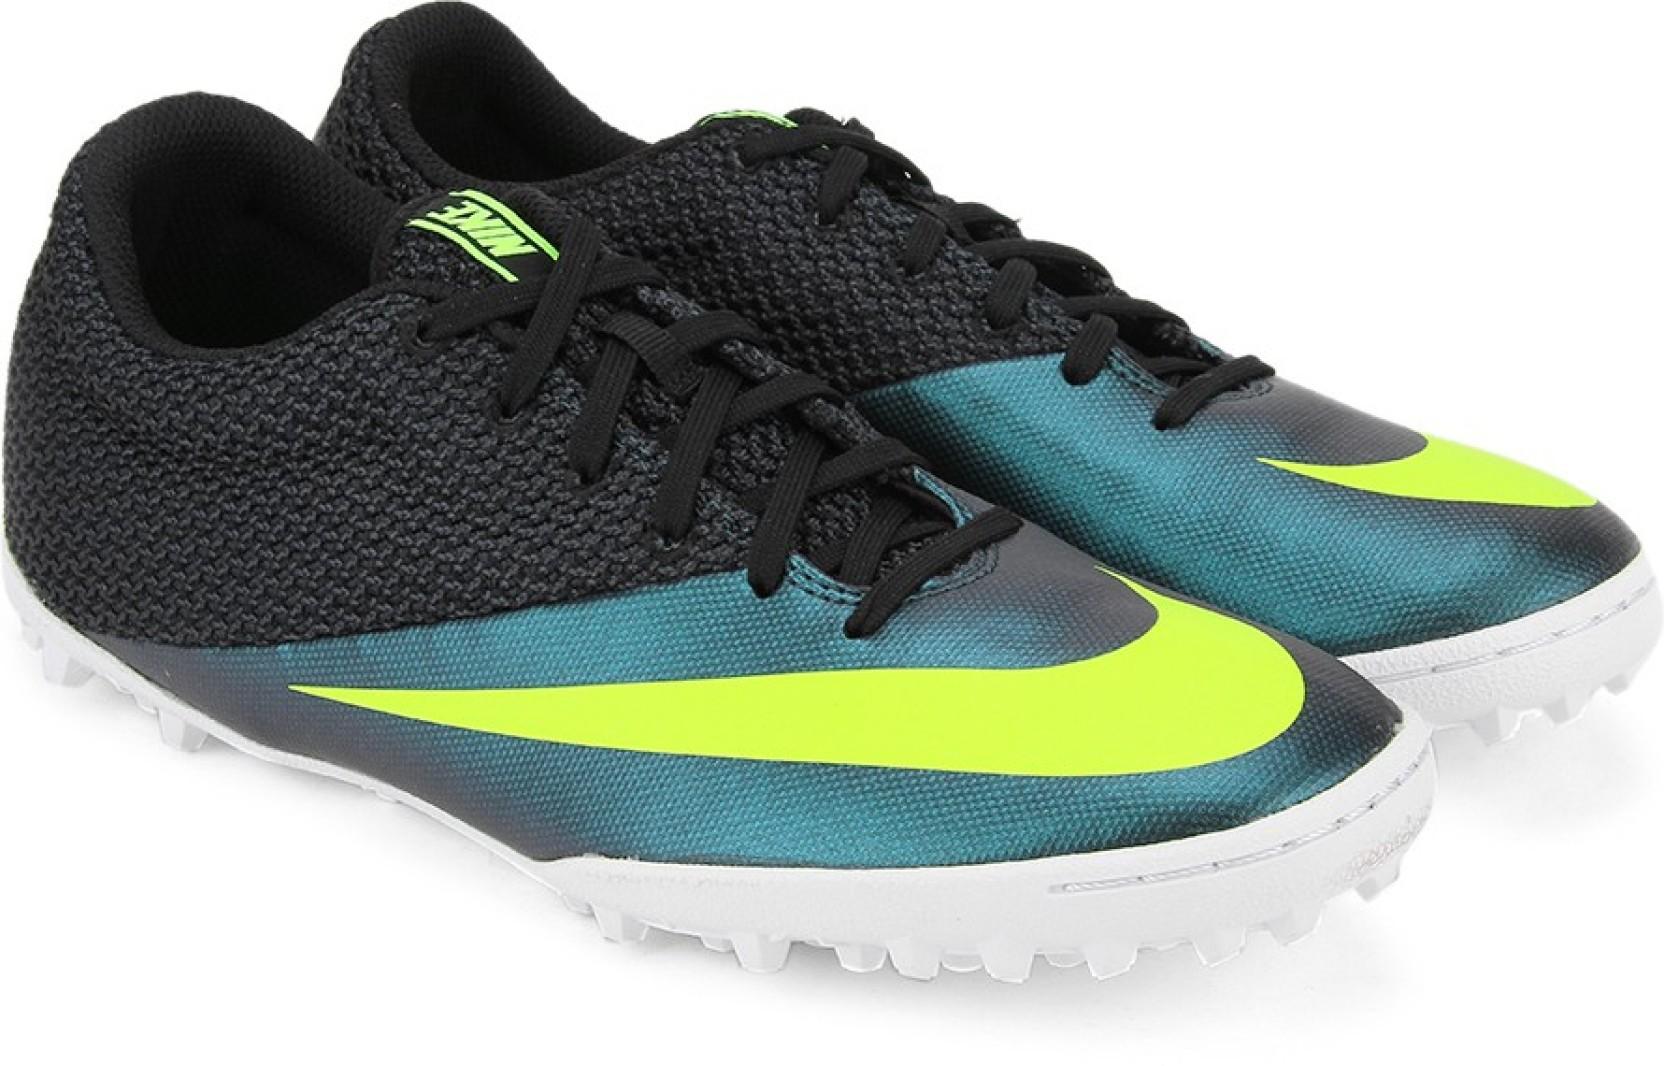 competitive price 92b26 9b7d8 ... get nike mercurialx pro tf men football shoes for men black blue green  fef8b 33538